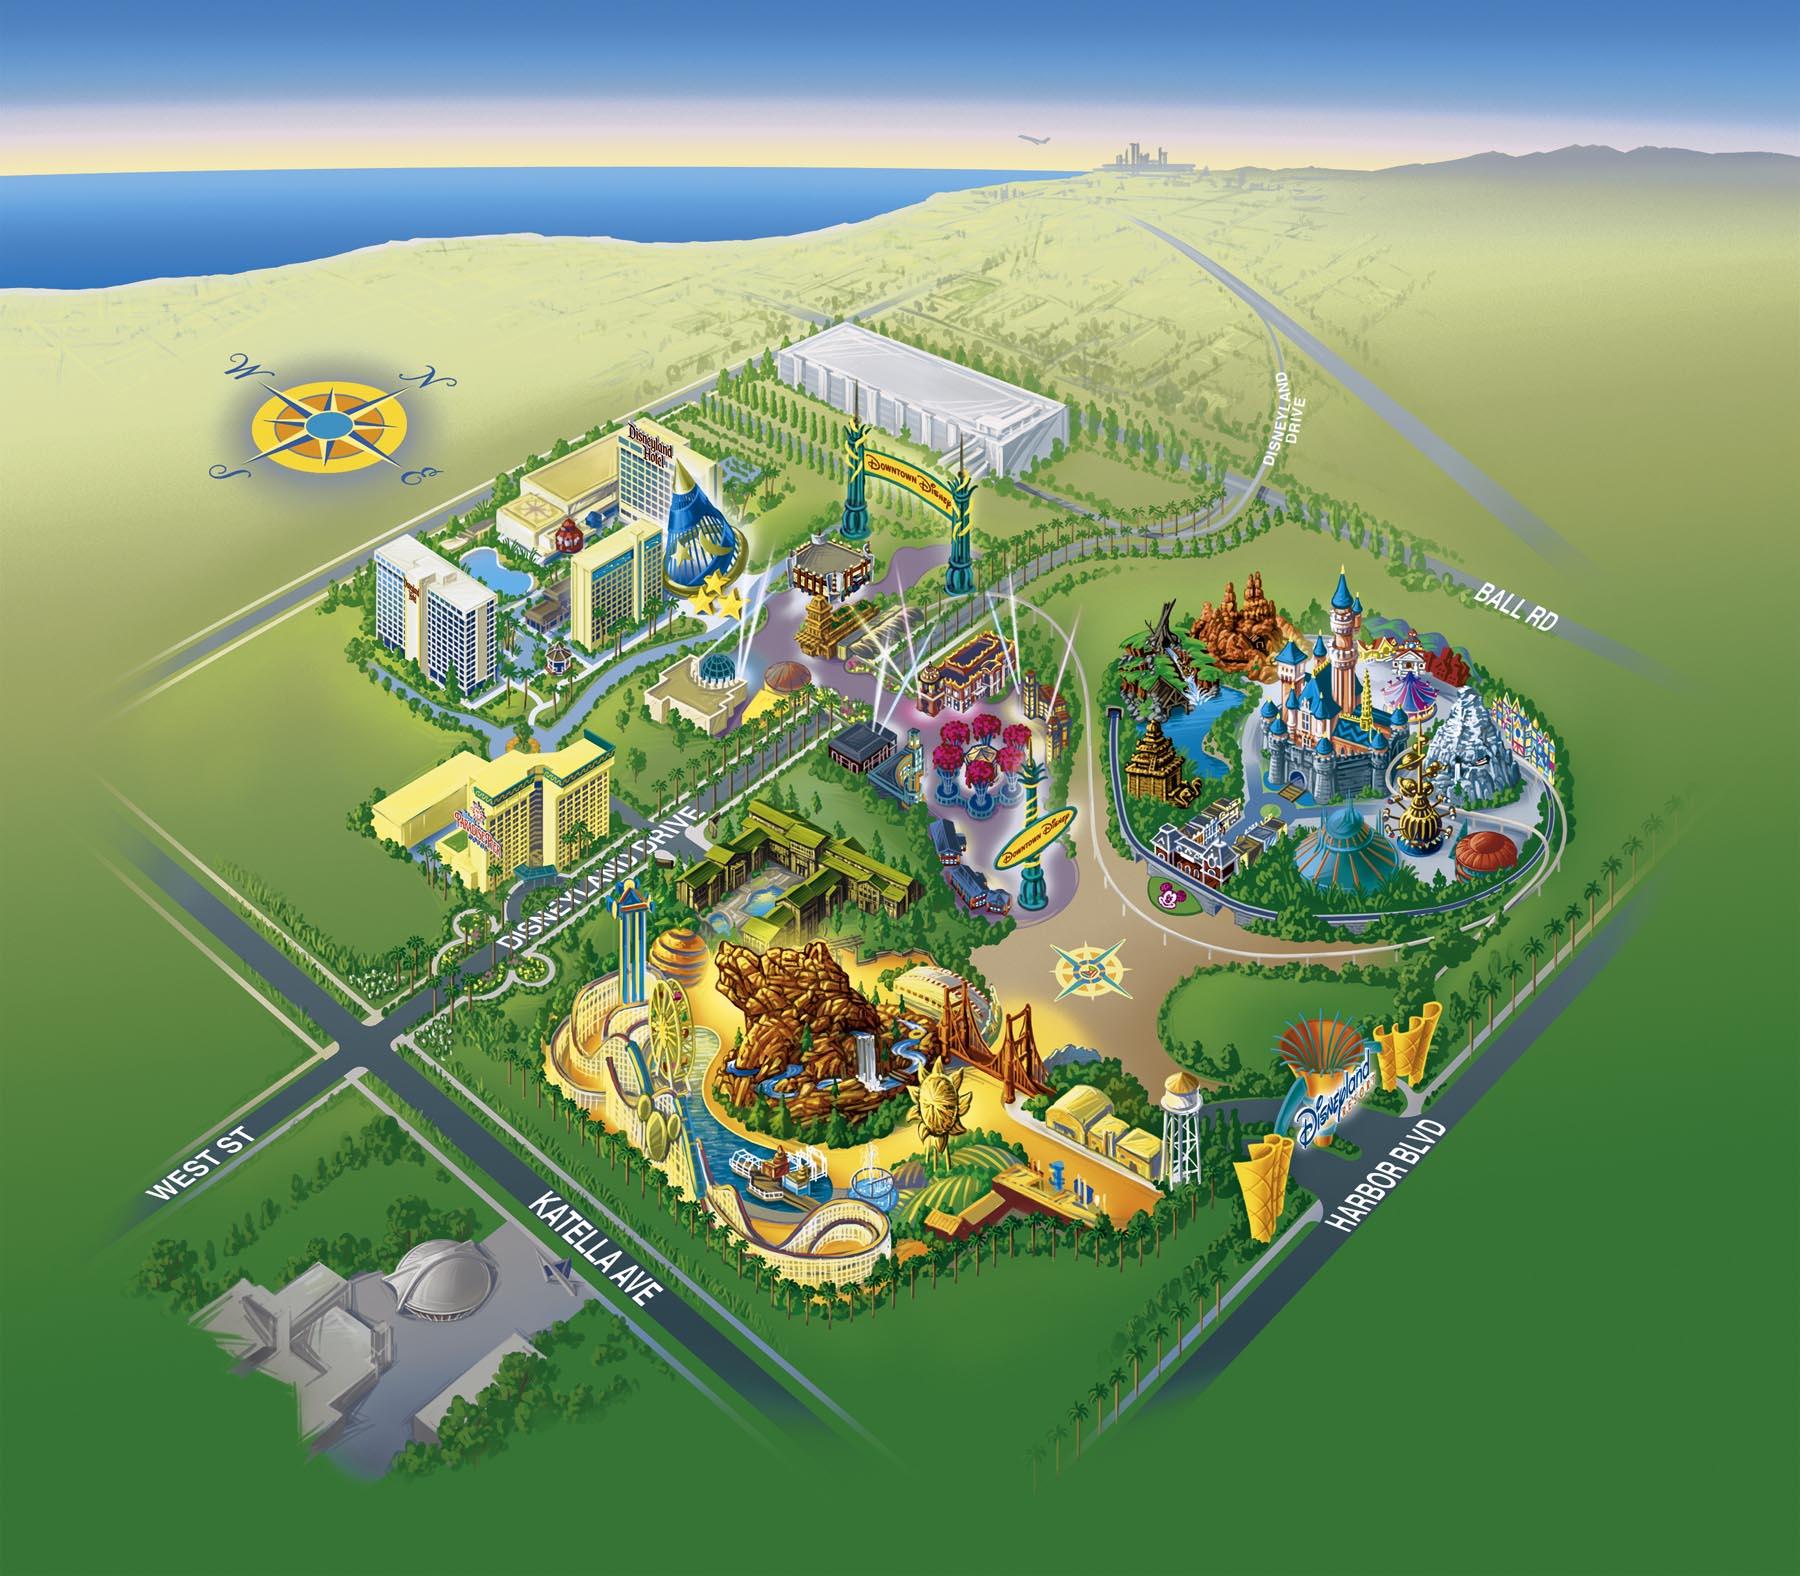 image relating to Printable Disney Park Maps identify Disneyland Vacation resort Disney Parks Wiki FANDOM run through Wikia